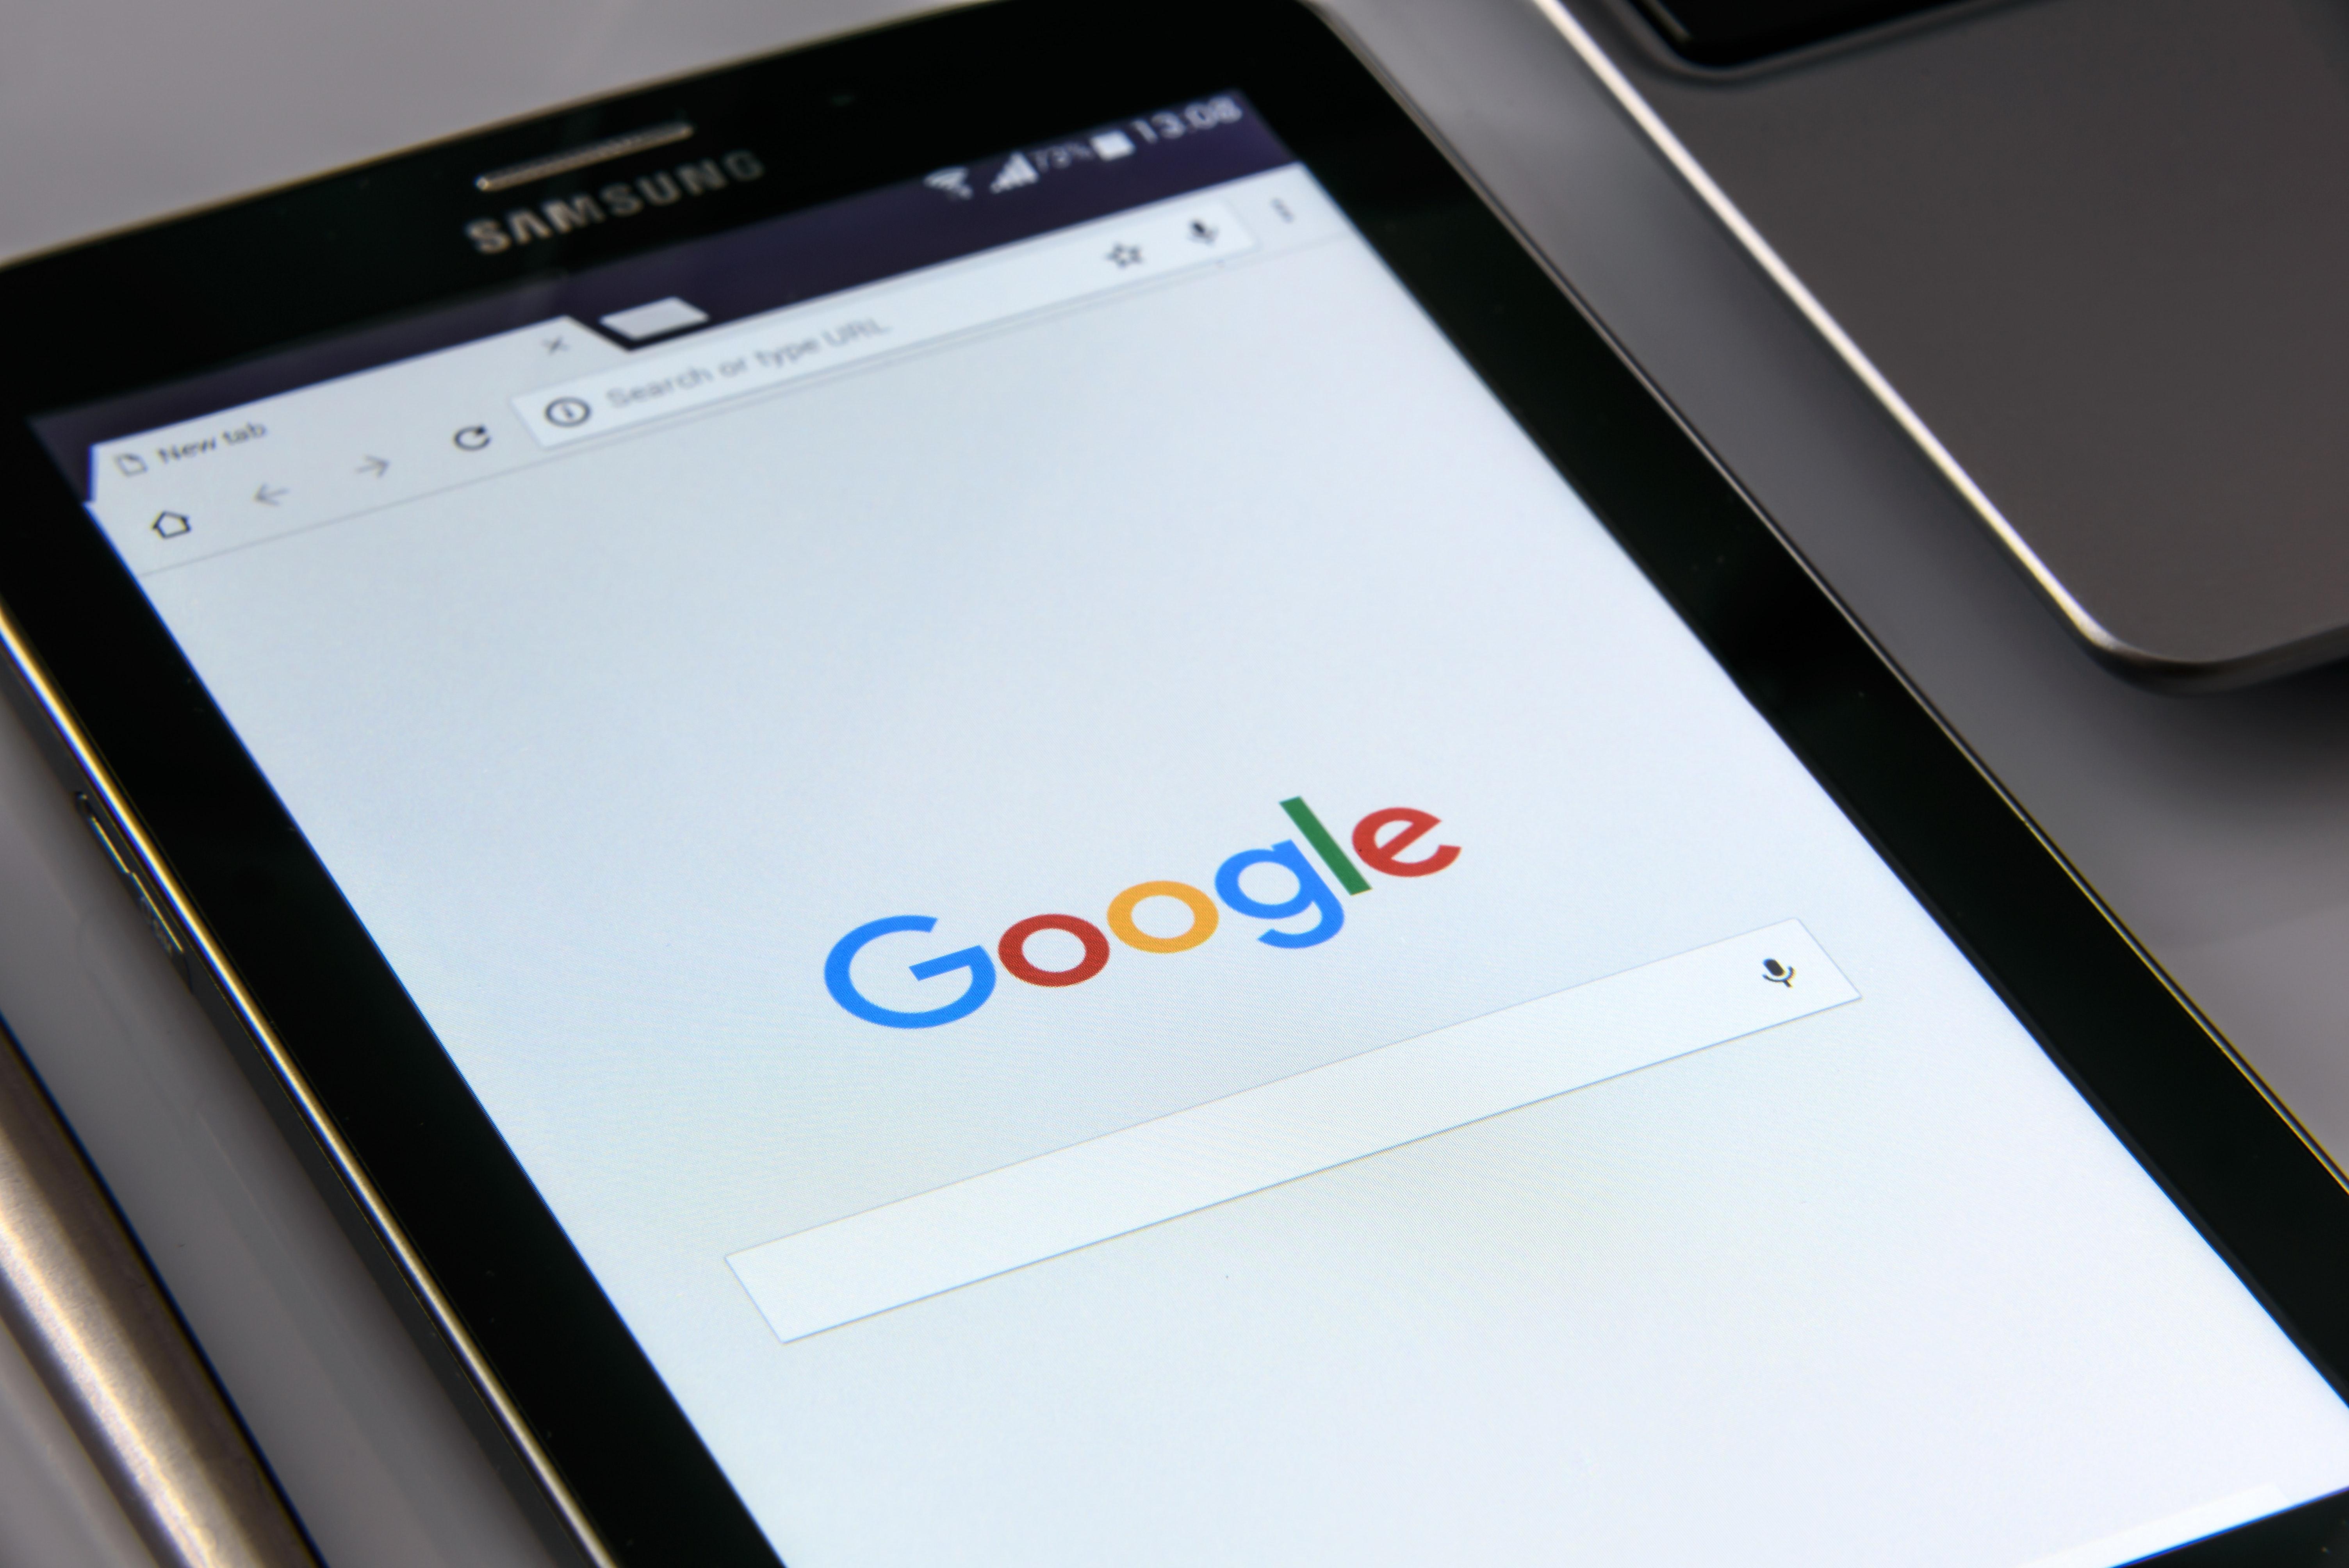 Google-Search-Tricks-Tips